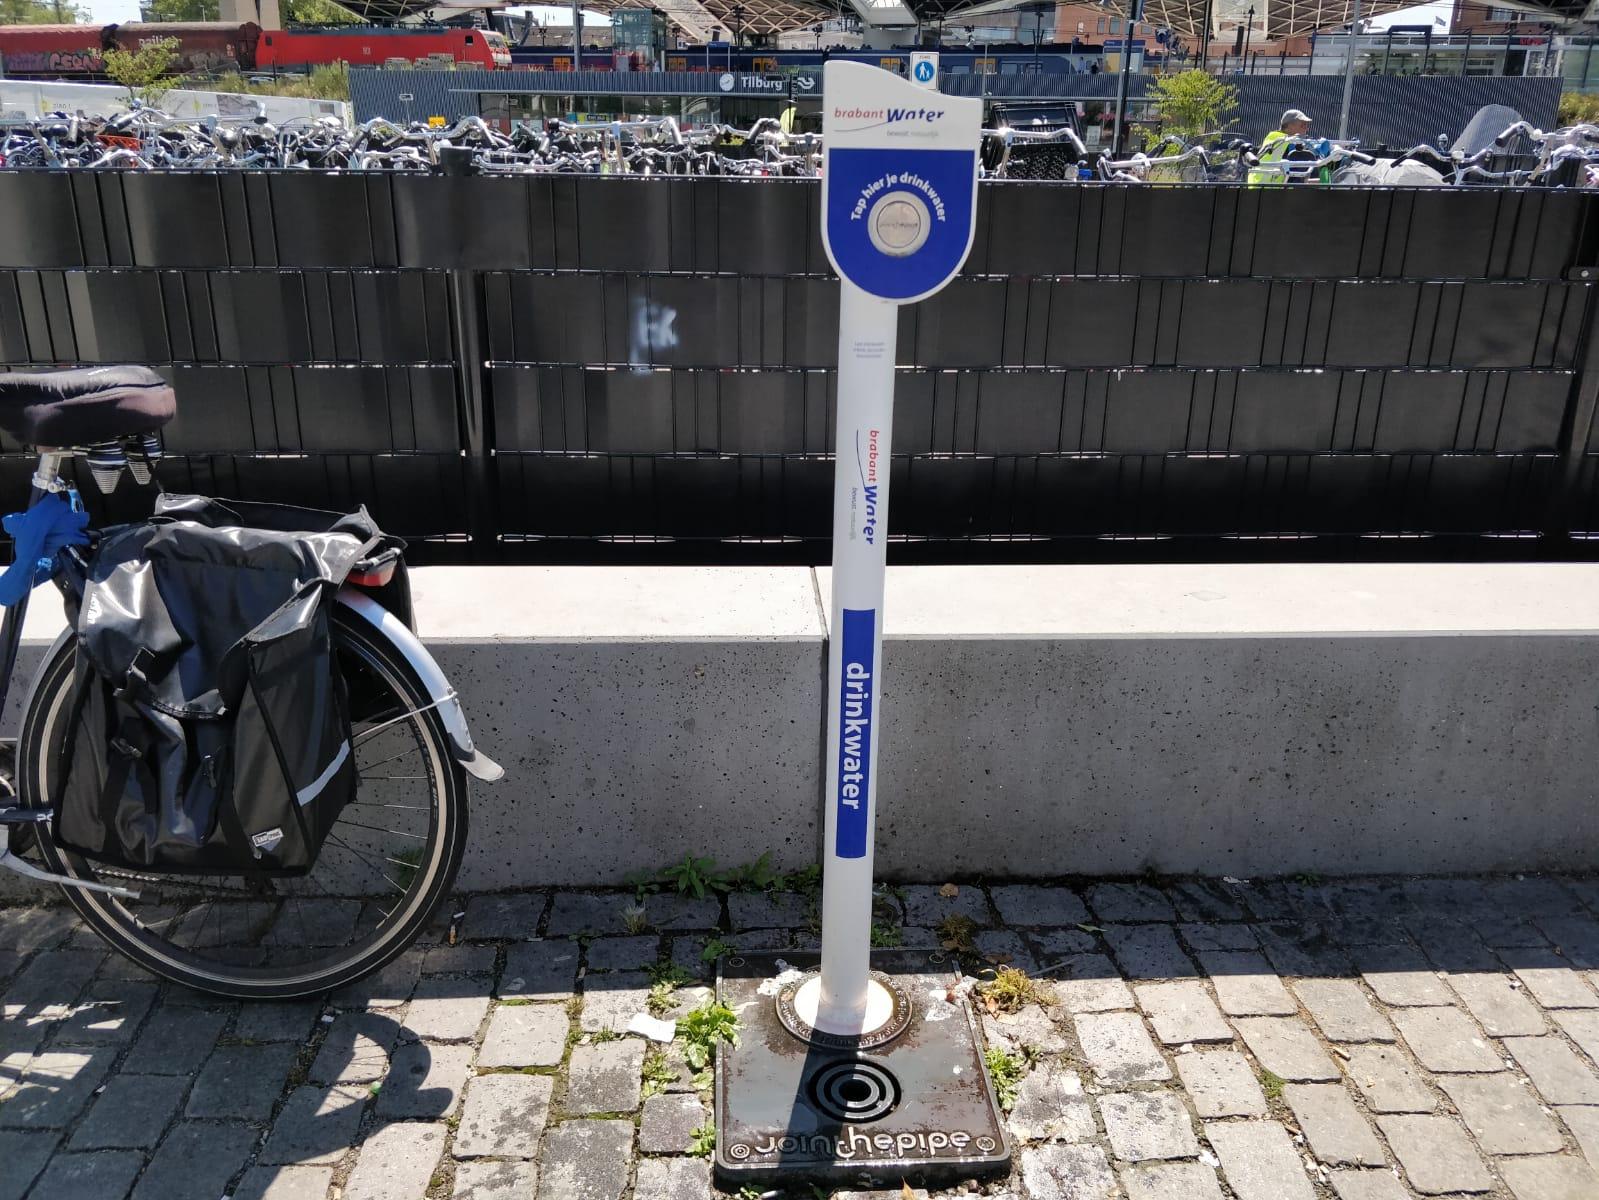 openbare watertappunten Tilburg